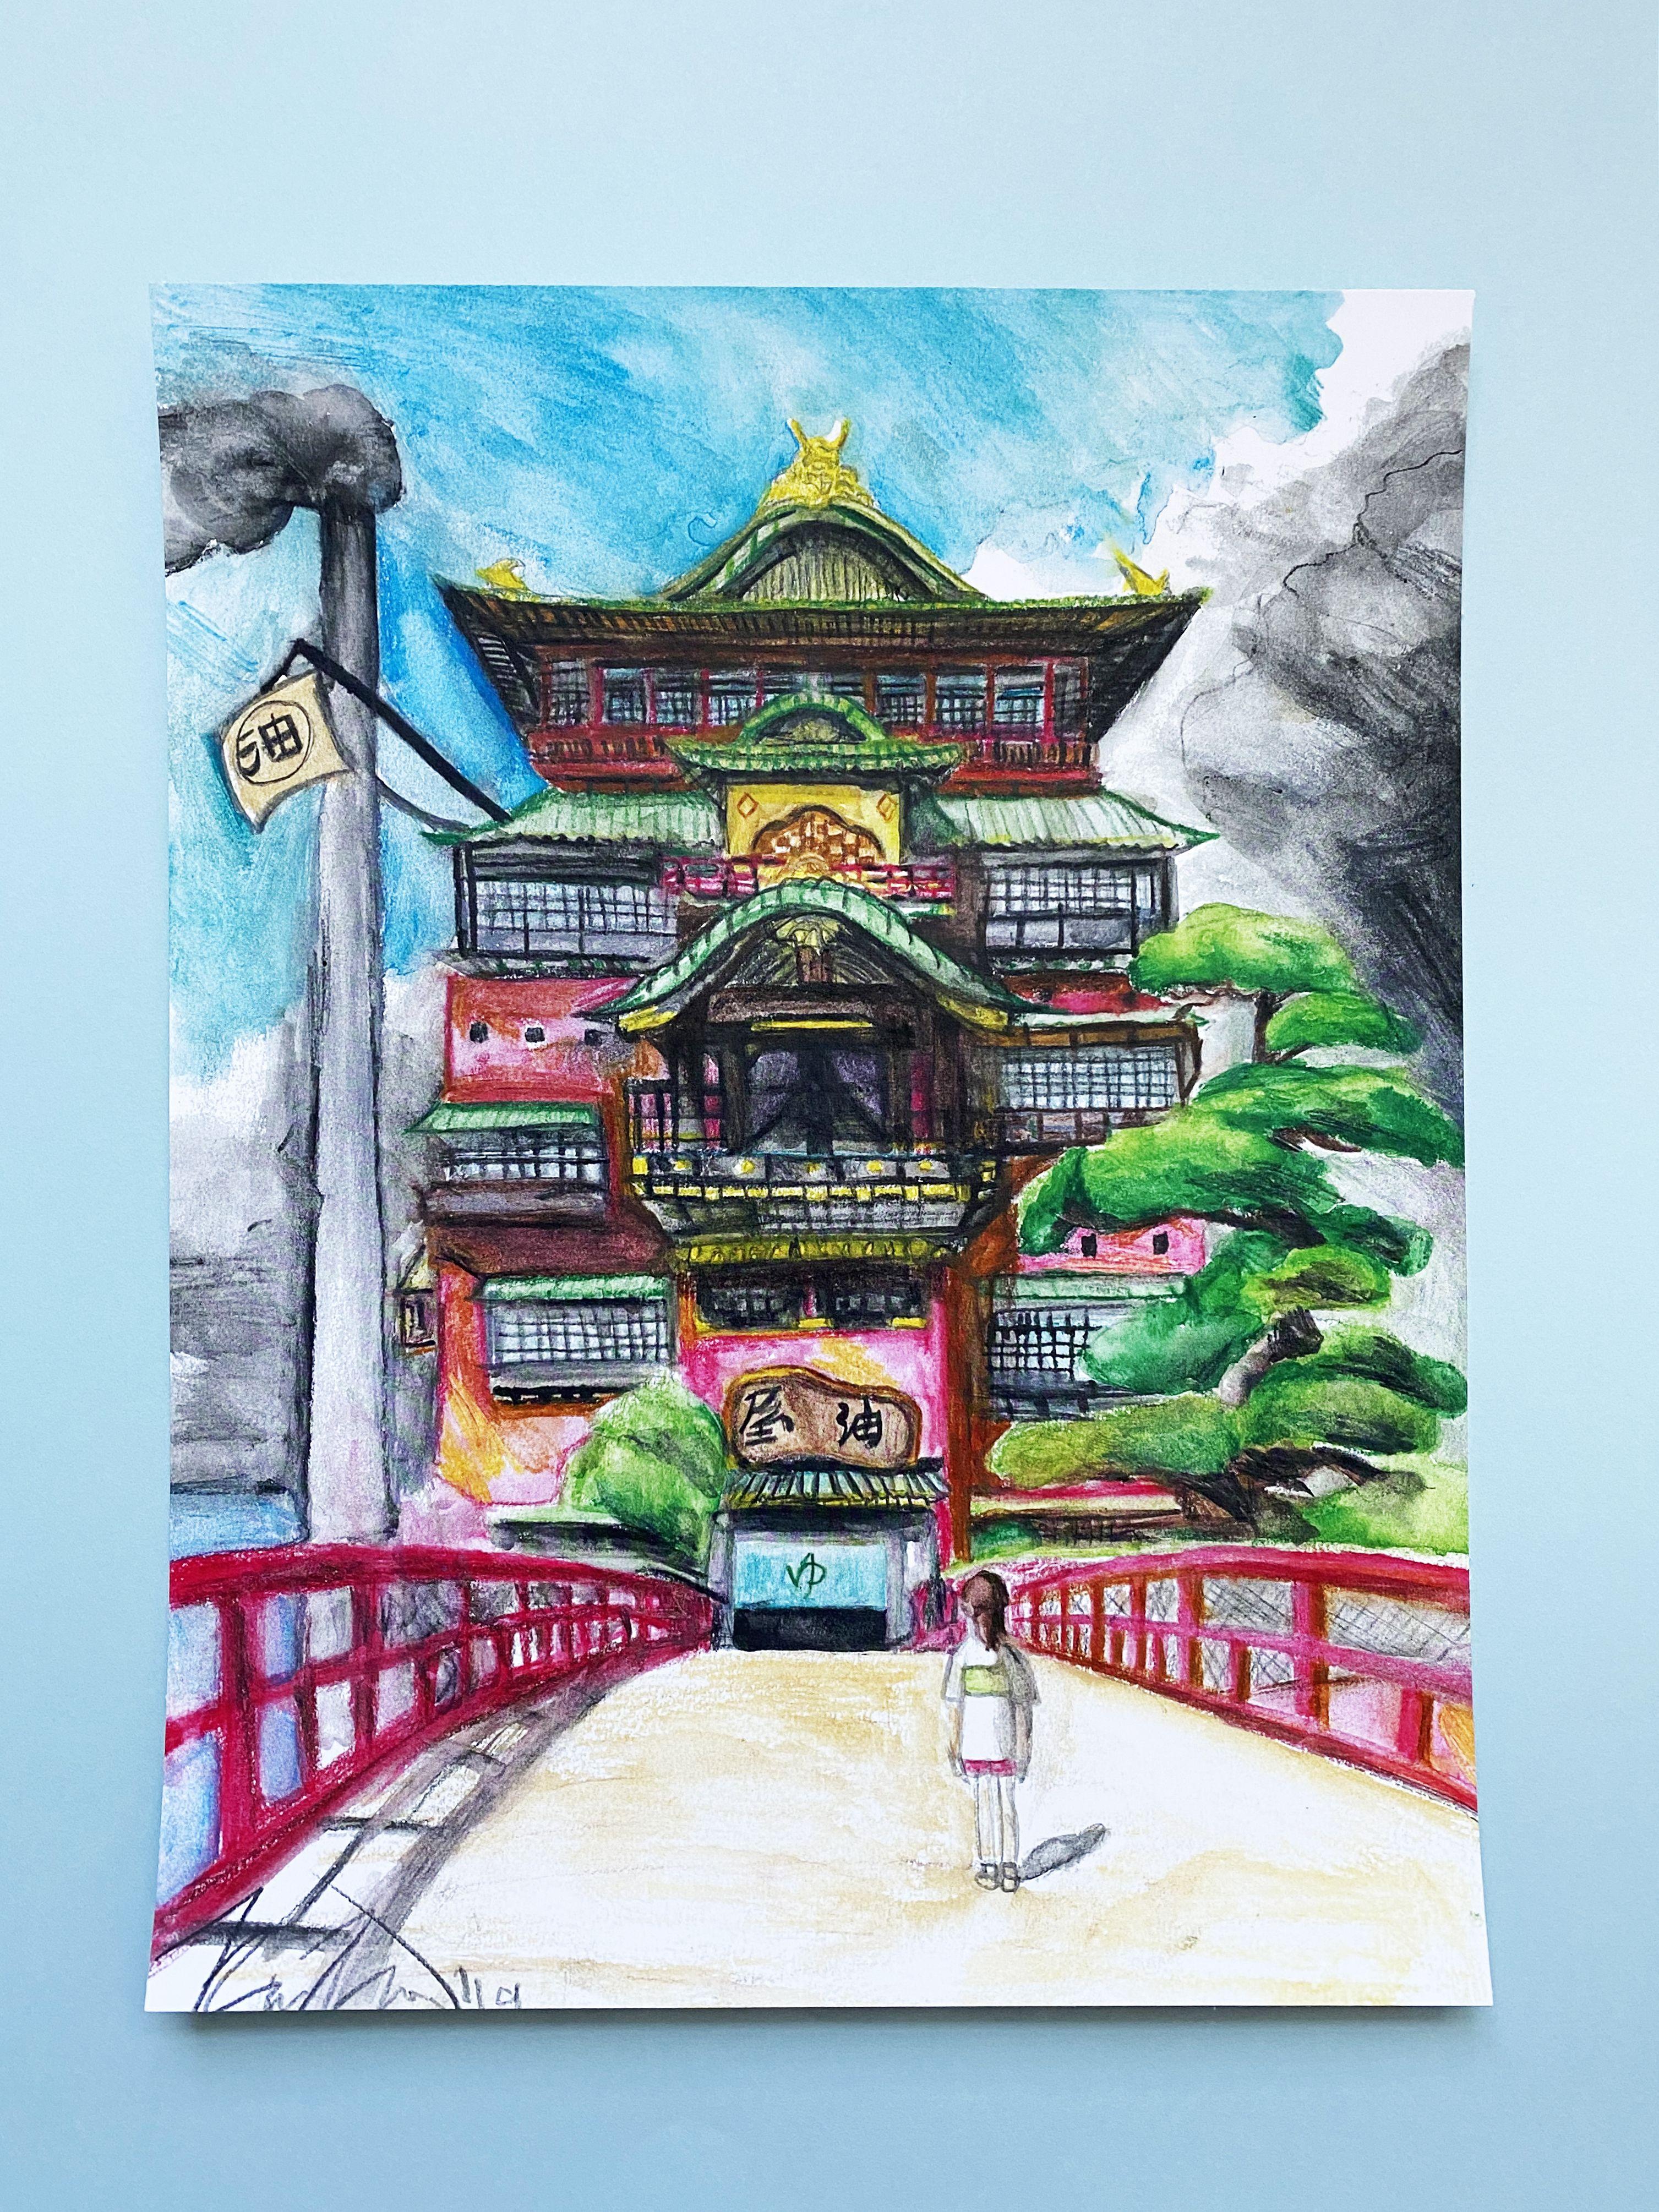 Spirited Away Aesthetic Anime Art Studio Ghibli Watercolor Painting Drawing Decor Fan Art Print Japanese Art Watercolor Wall Art Studio Ghibli Art